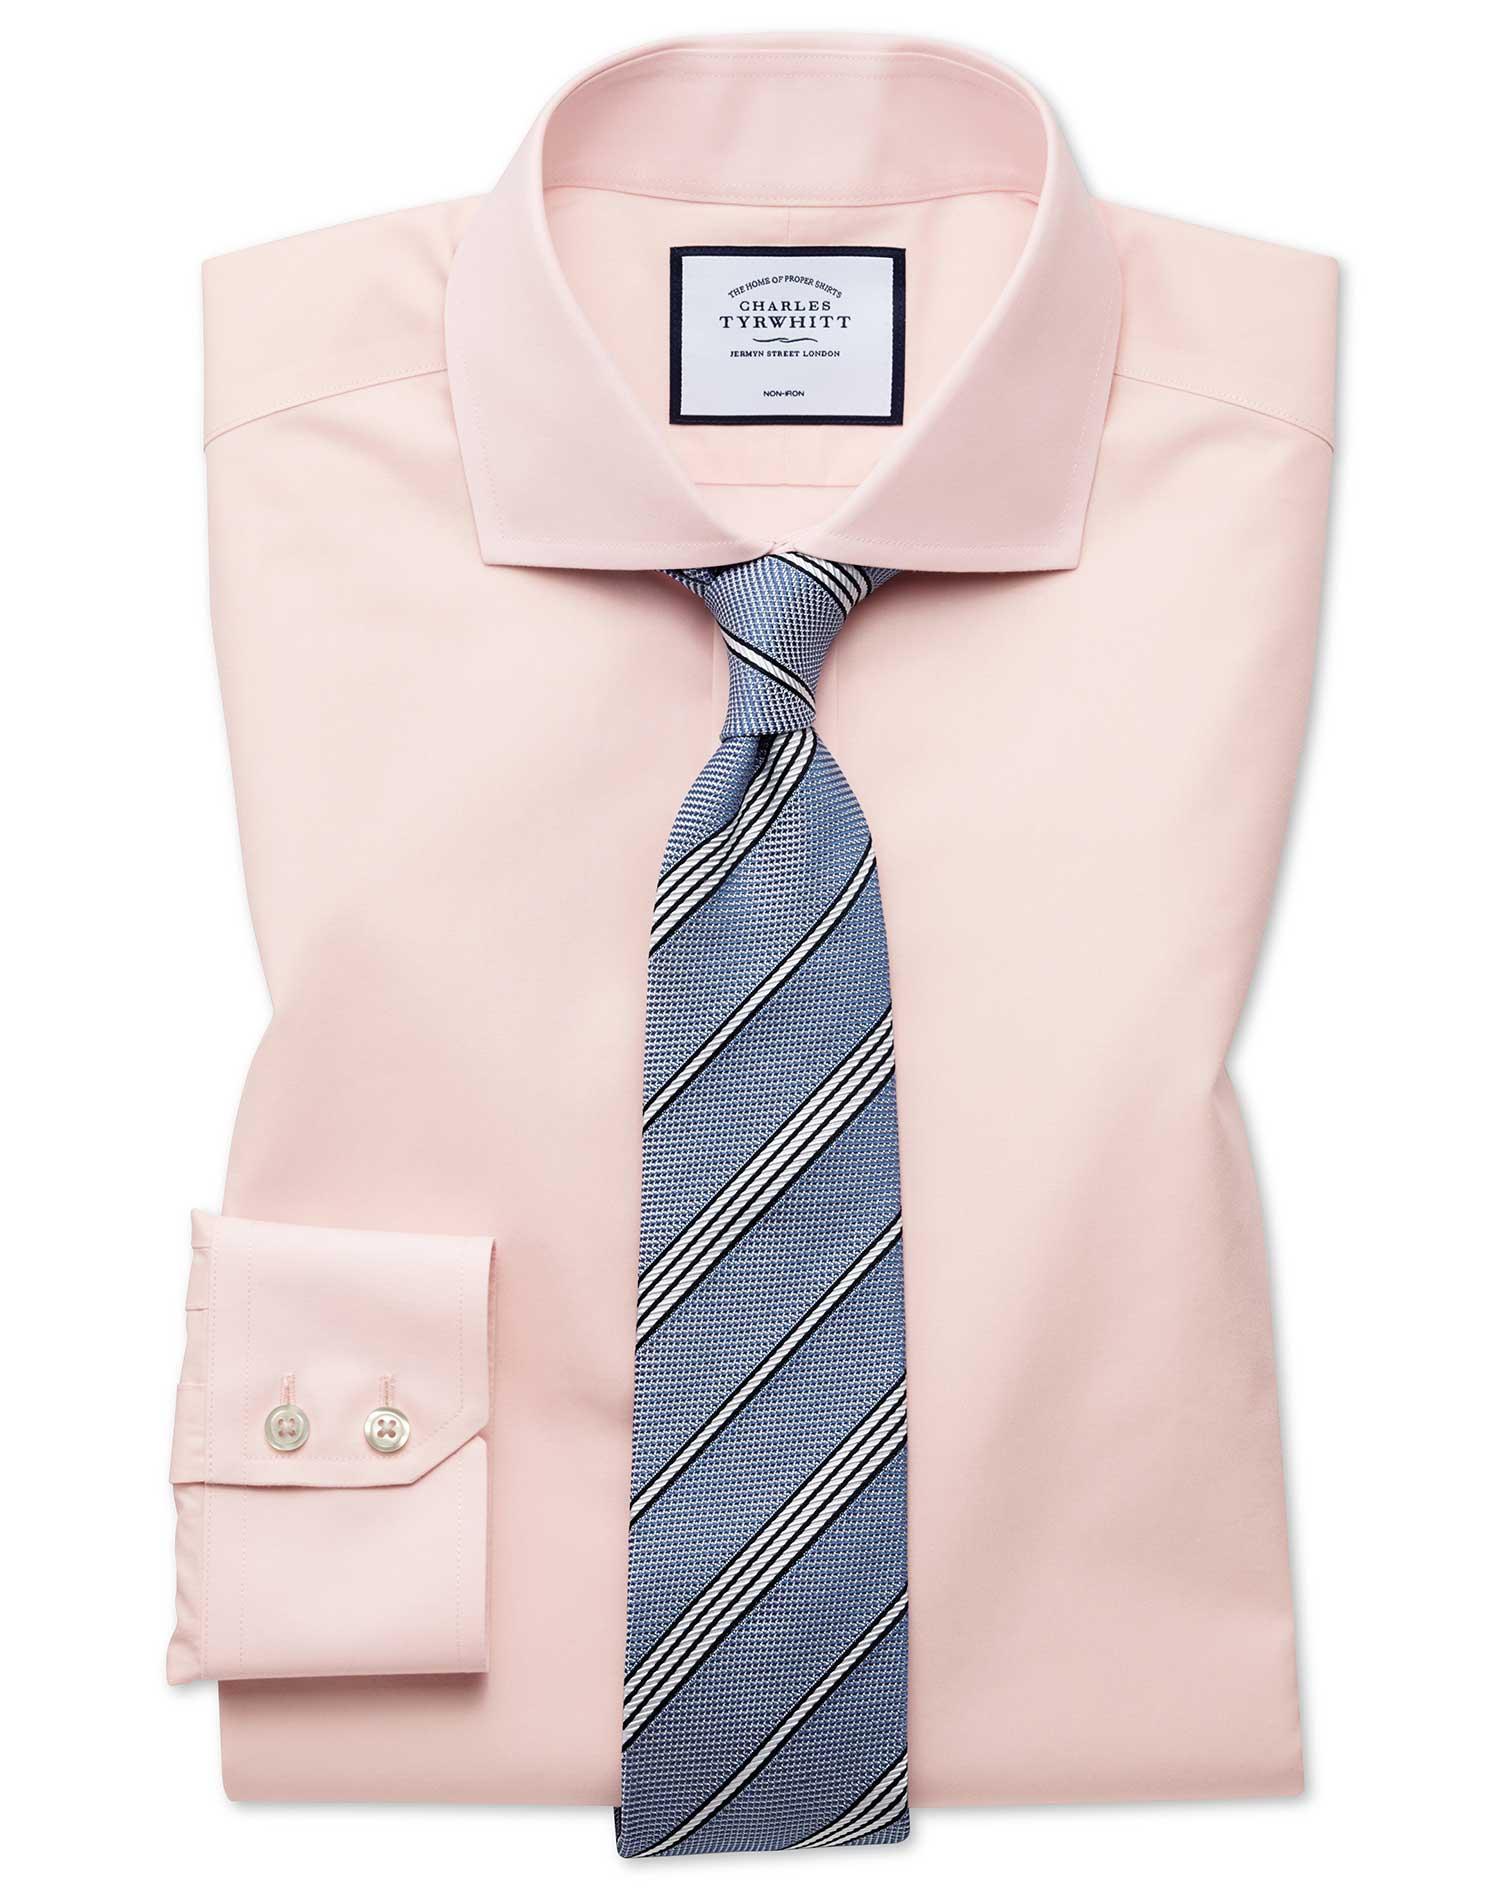 Slim Fit Non-Iron Tyrwhitt Cool Poplin Peach Cotton Formal Shirt Single Cuff Size 16/33 by Charles T